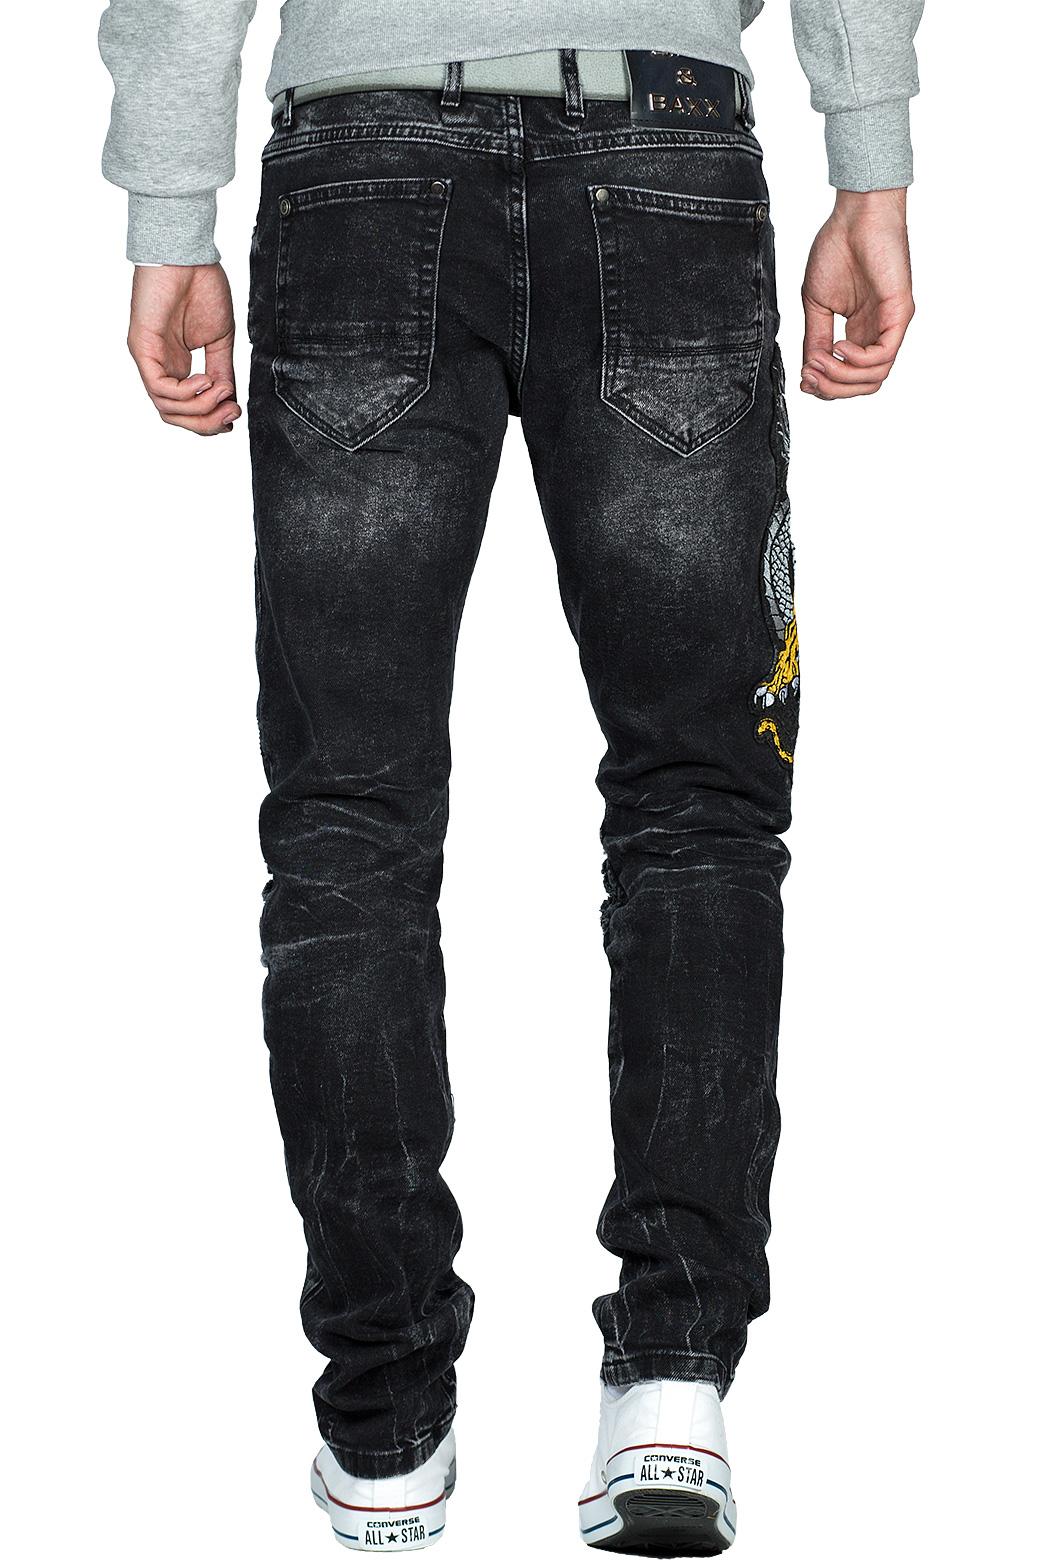 Cipo-amp-Baxx-Uomo-Jeans-Pantaloni-ricamate-Biker-Style-streetwear-nervature-pattern-Dope miniatura 4